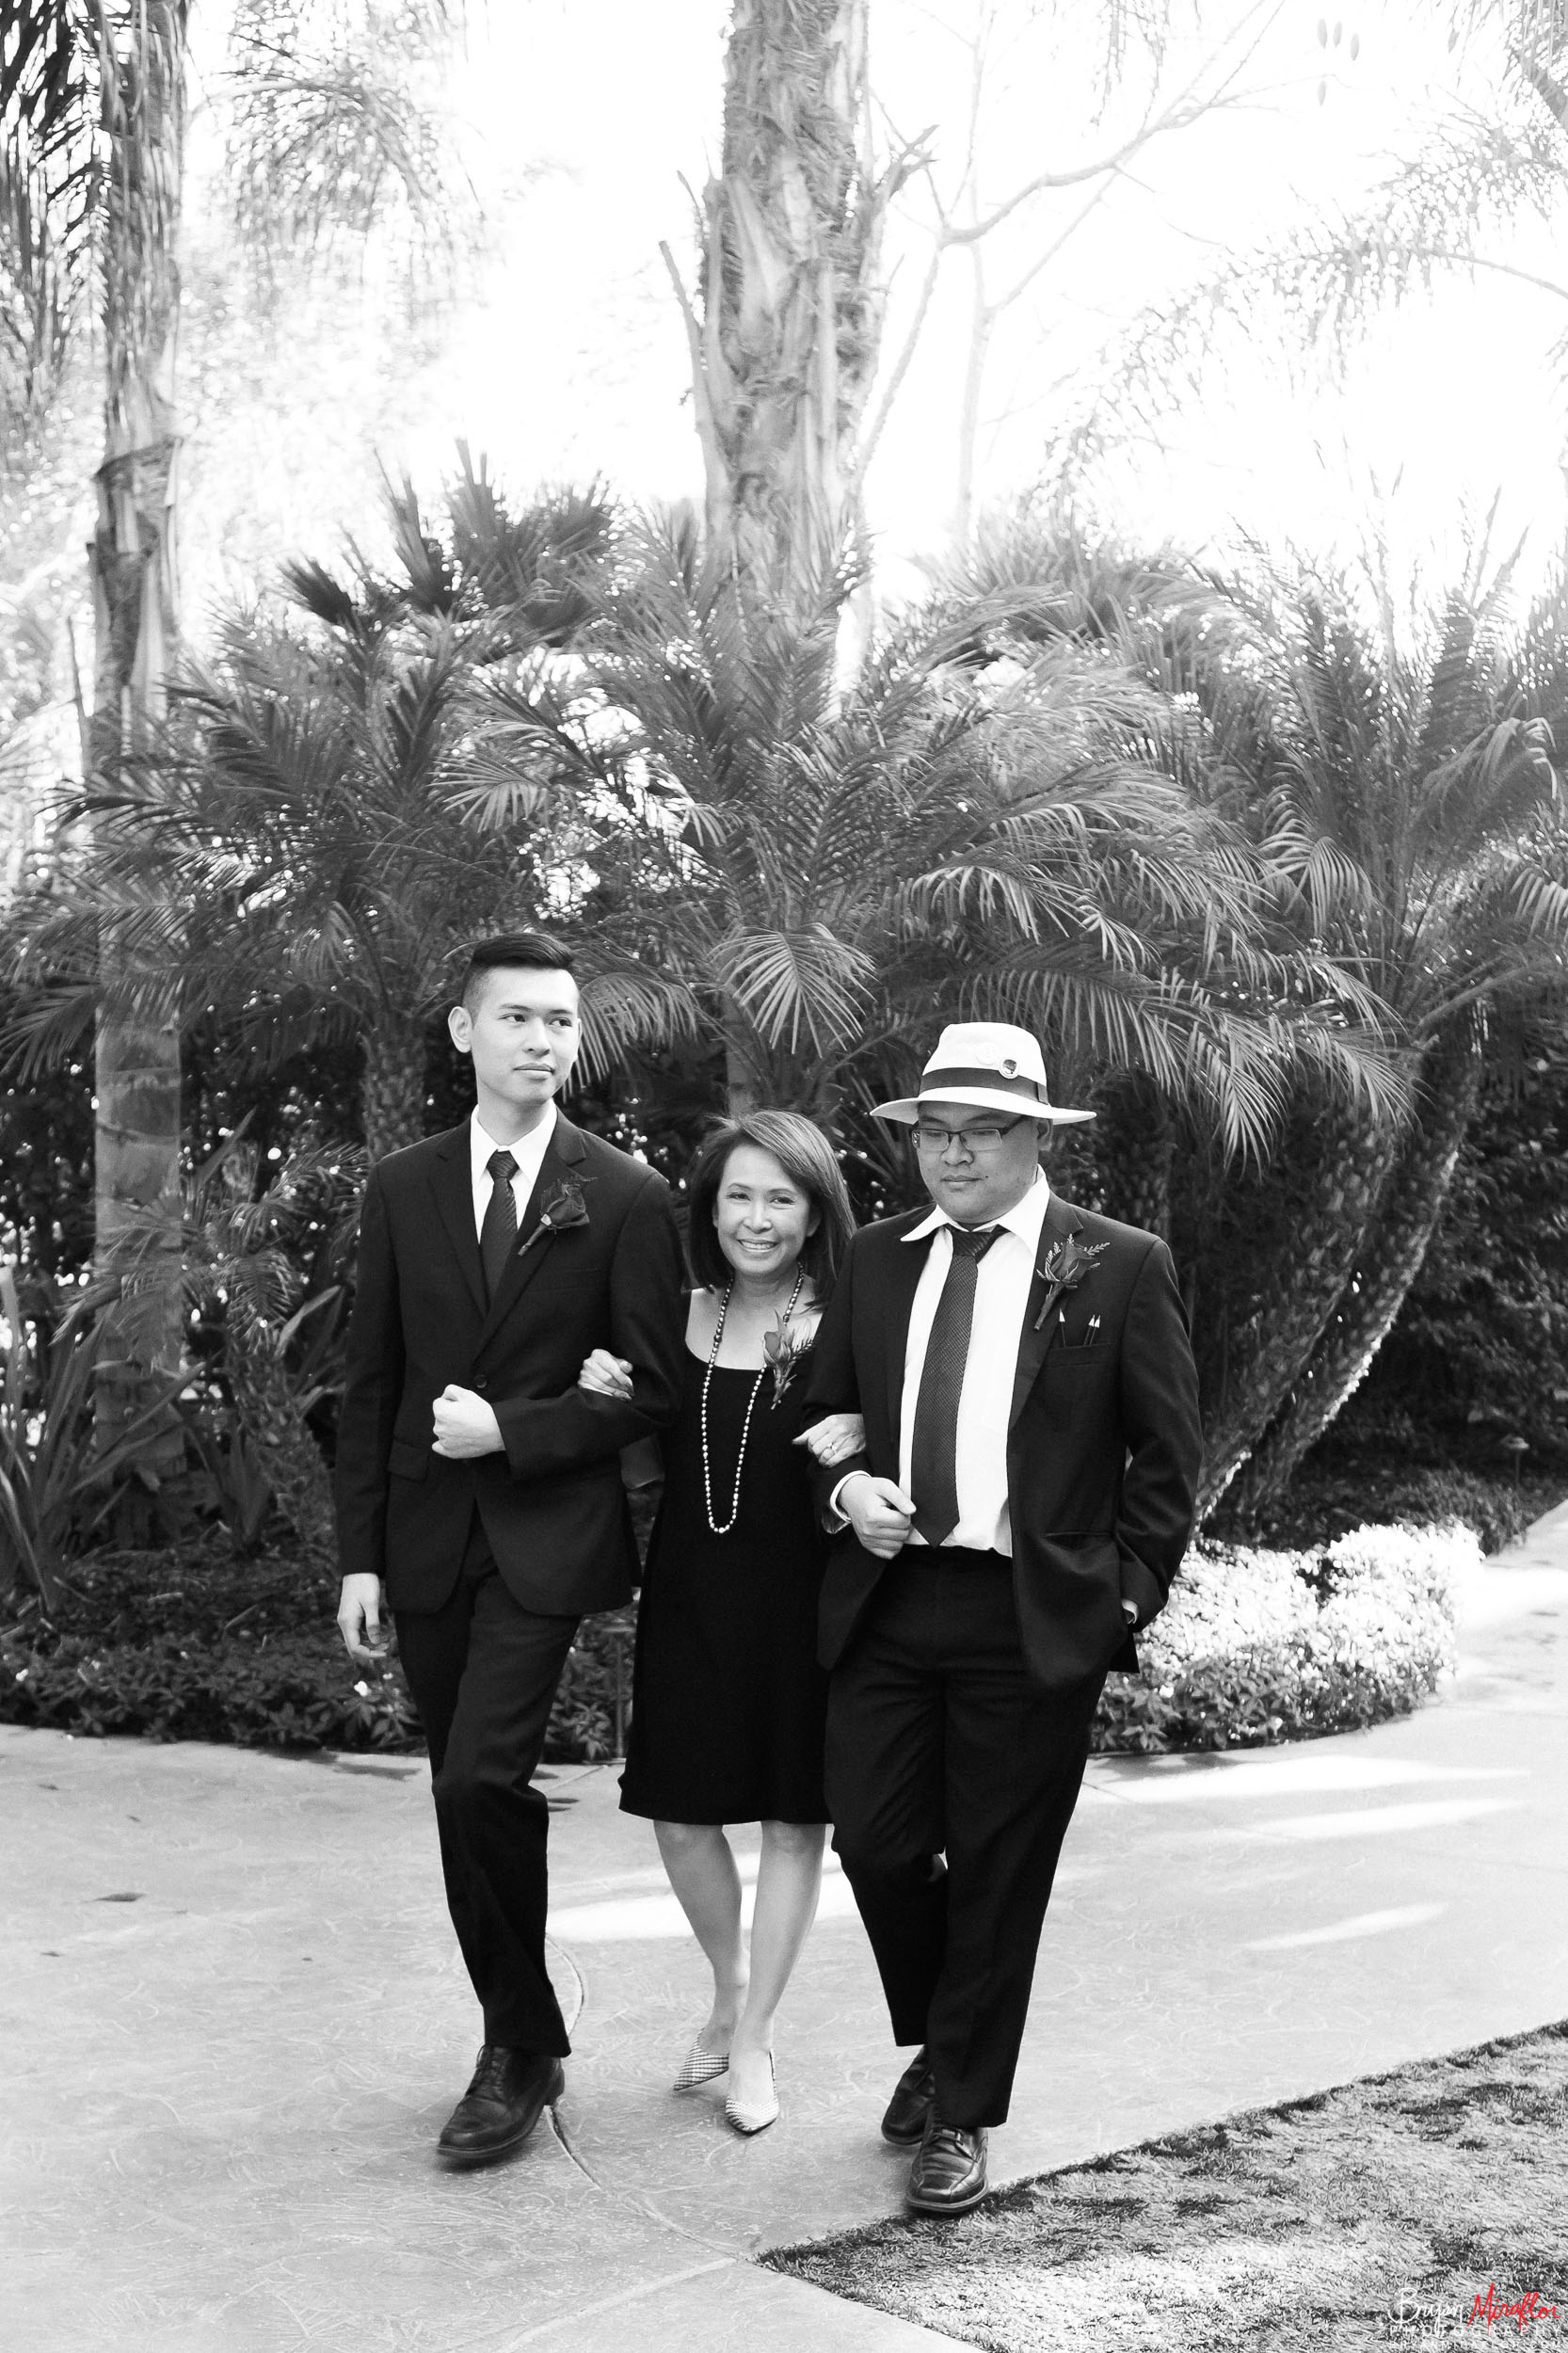 Bryan-Miraflor-Photography-Hannah-Jonathan-Married-Grand-Traditions-Estate-Gardens-Fallbrook-20171222-082.jpg